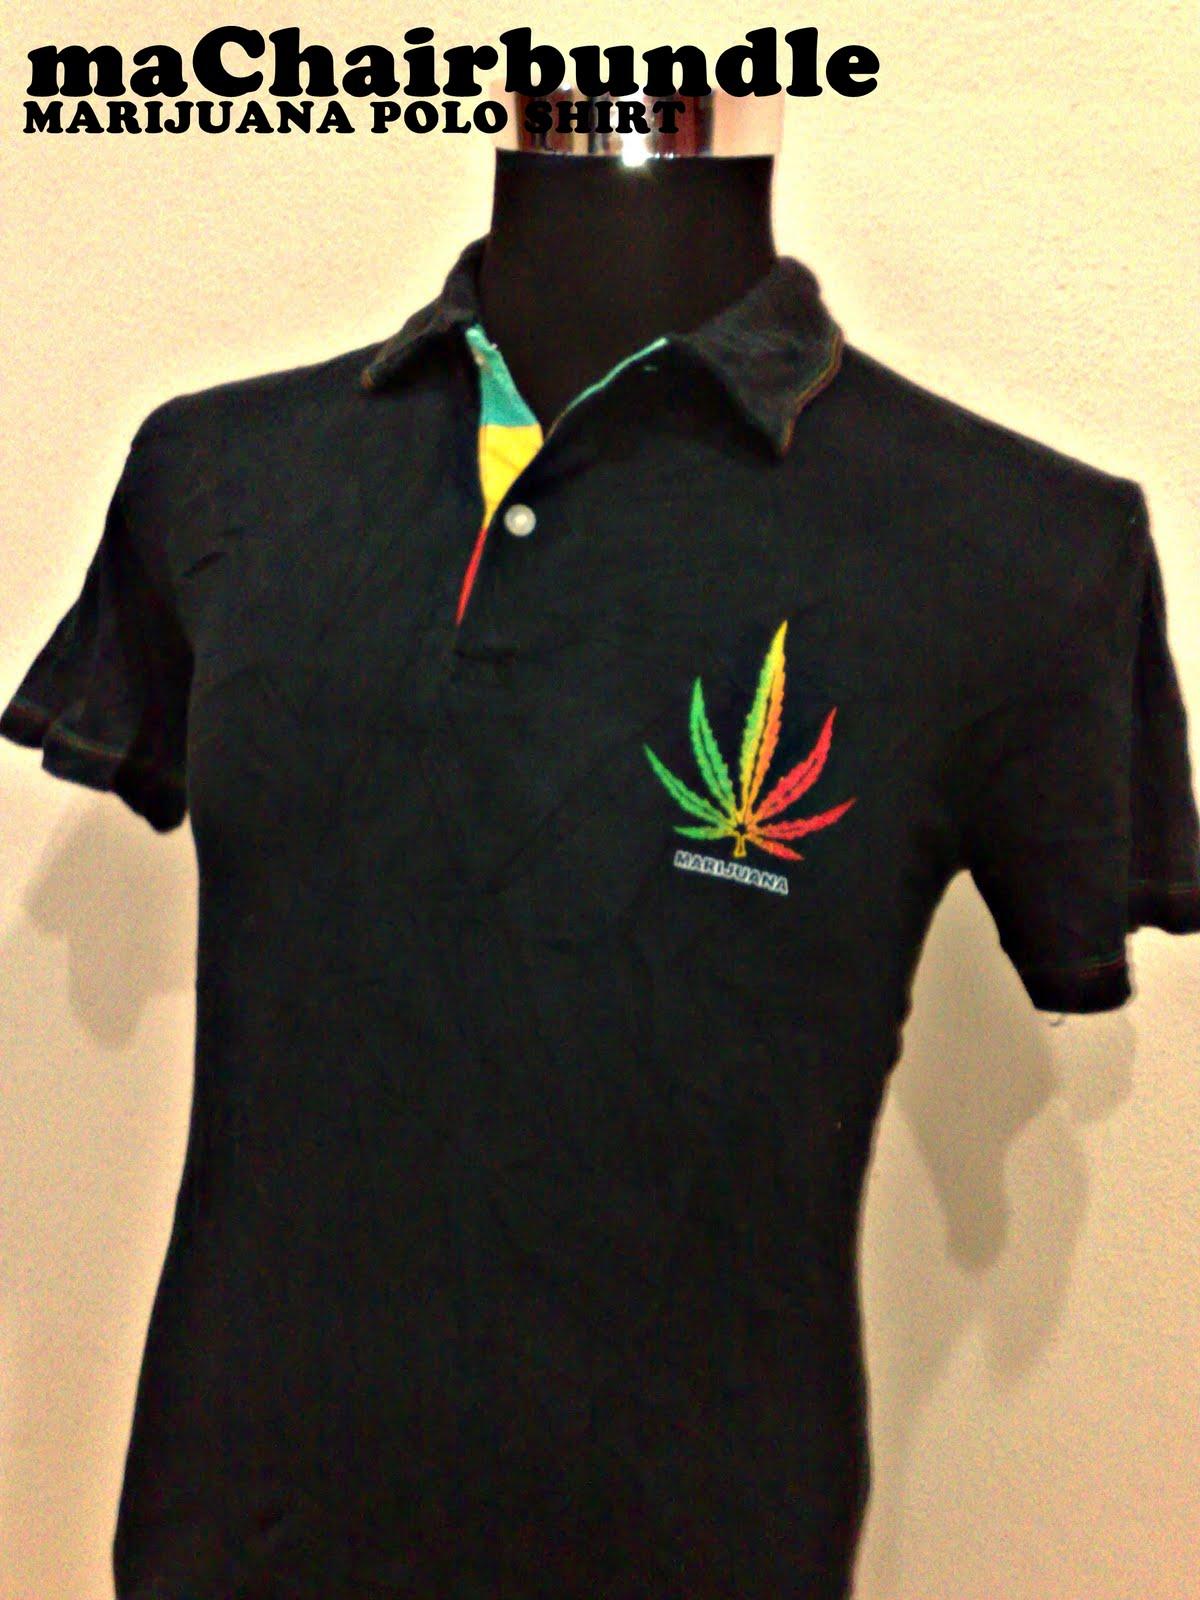 Machairbundle Marijuana Polo Shirt Rm30 Pc017 Sold